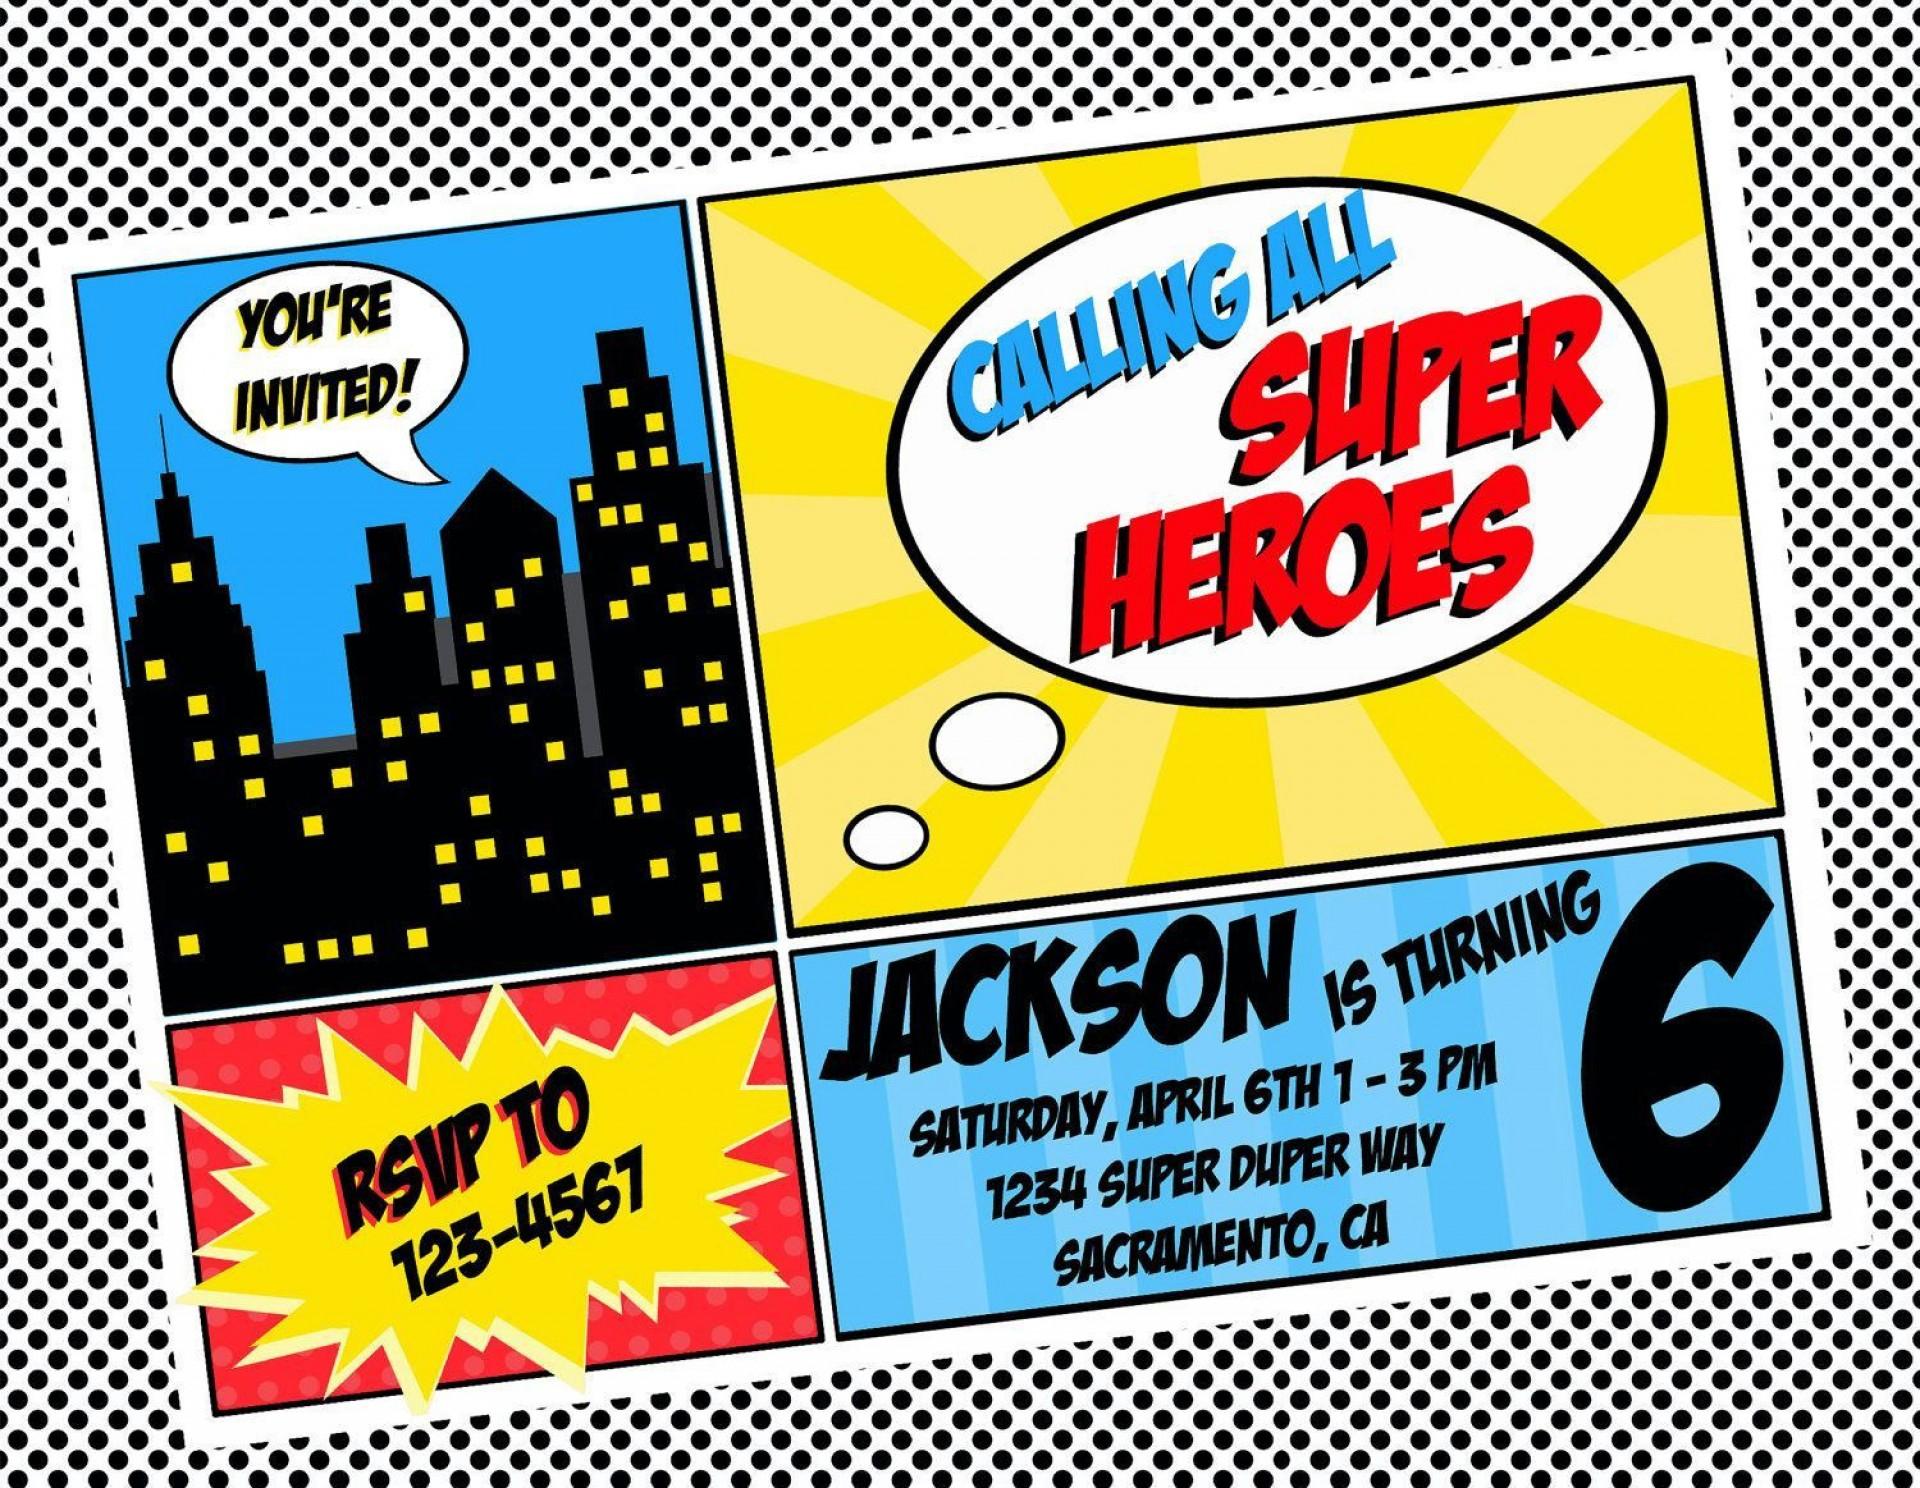 003 Shocking Superhero Birthday Party Invitation Template Free High Def  Invite1920